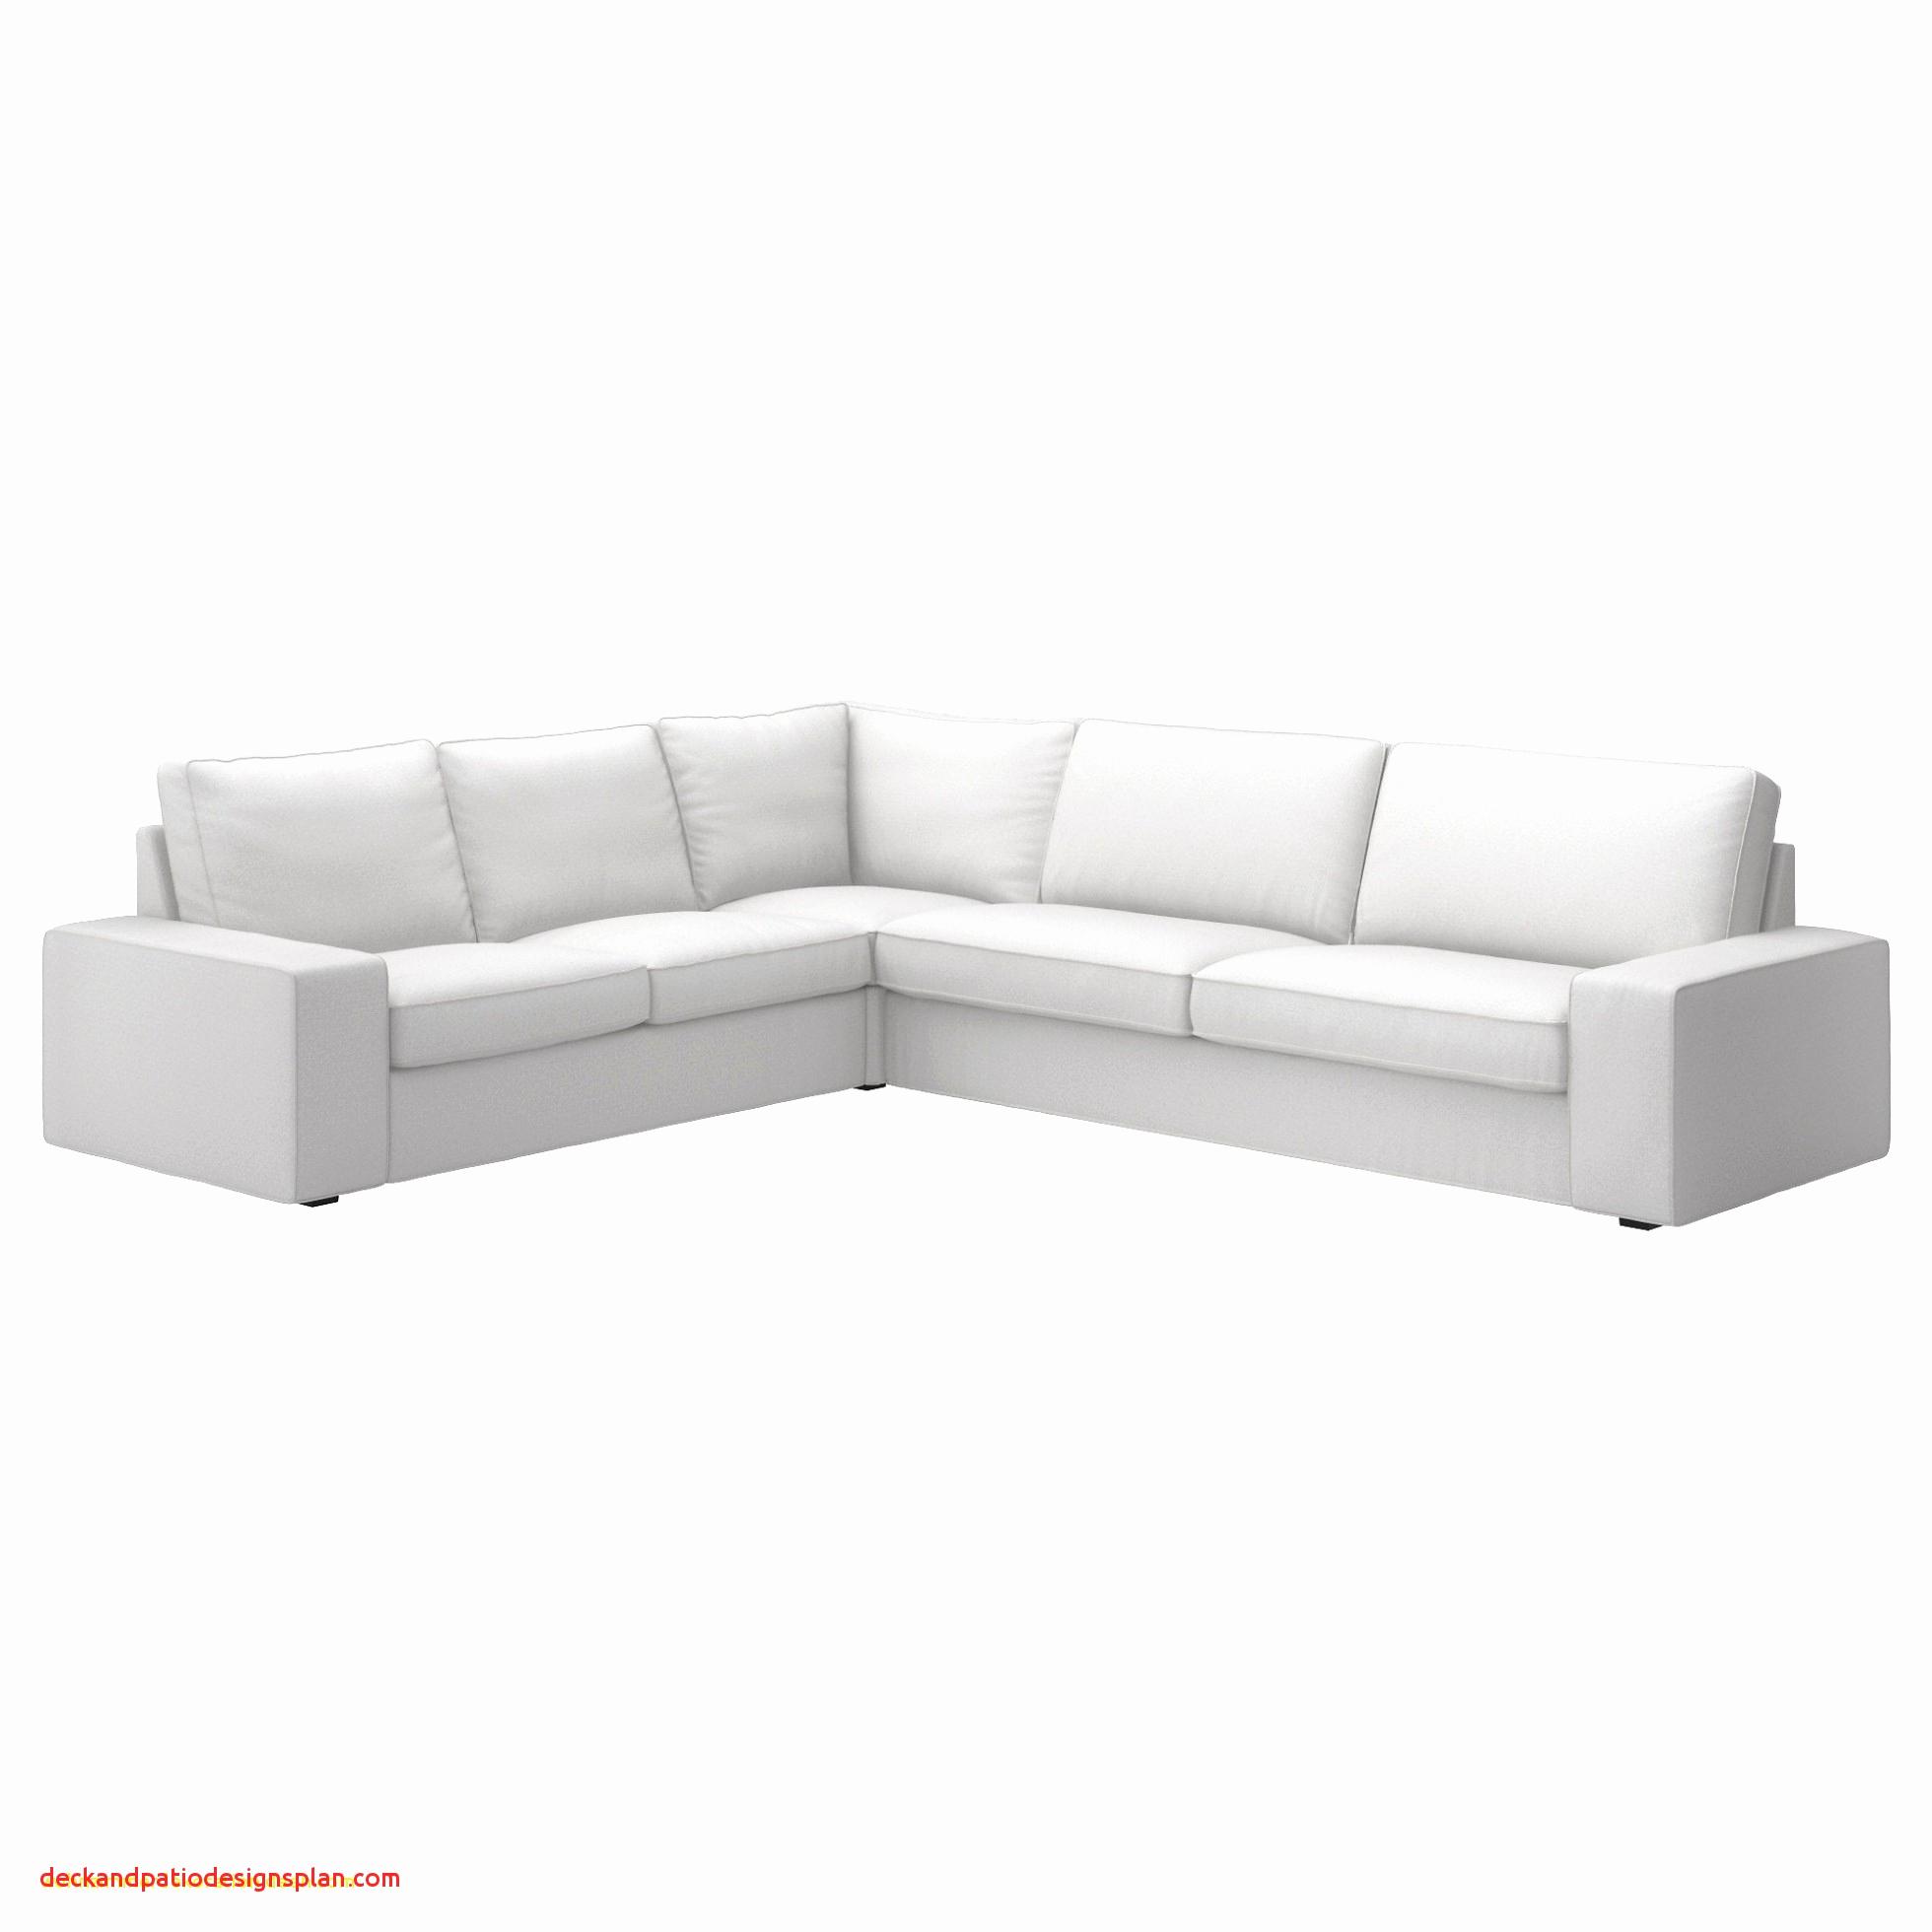 Ektorp 2 Places Unique Image 50 Luxury Ikea Ektorp Sleeper sofa Pics 50 S